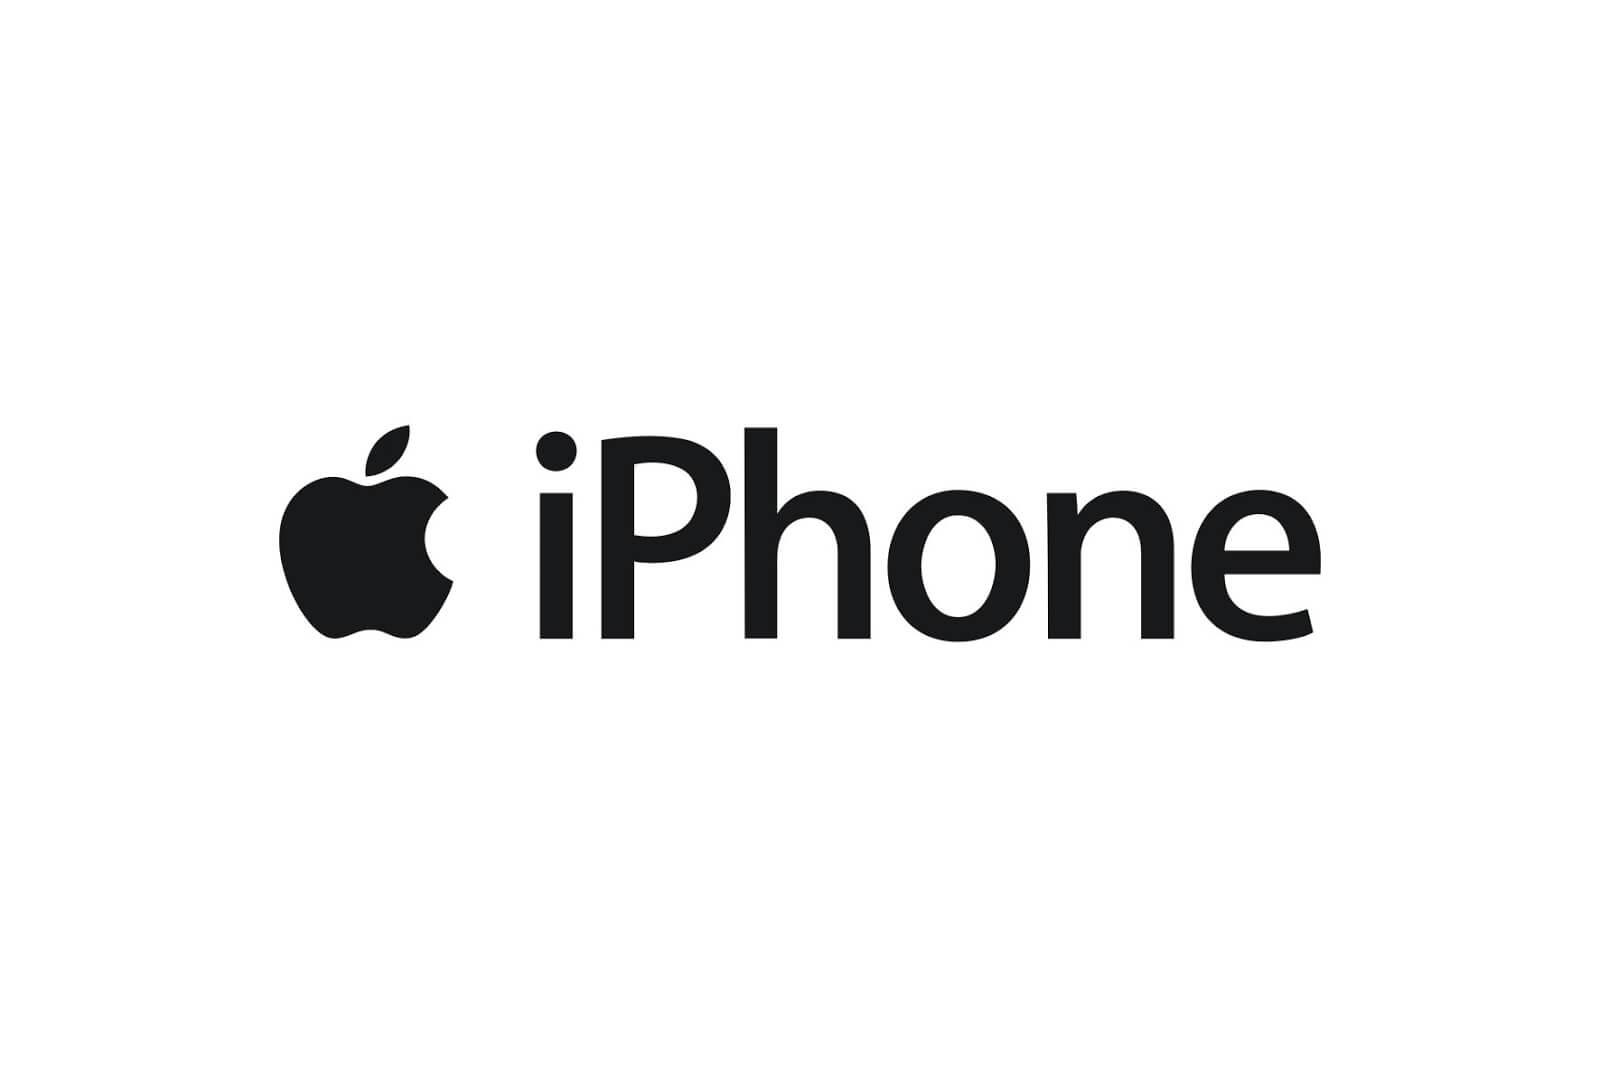 iphonex Black friday cybermonday 2017